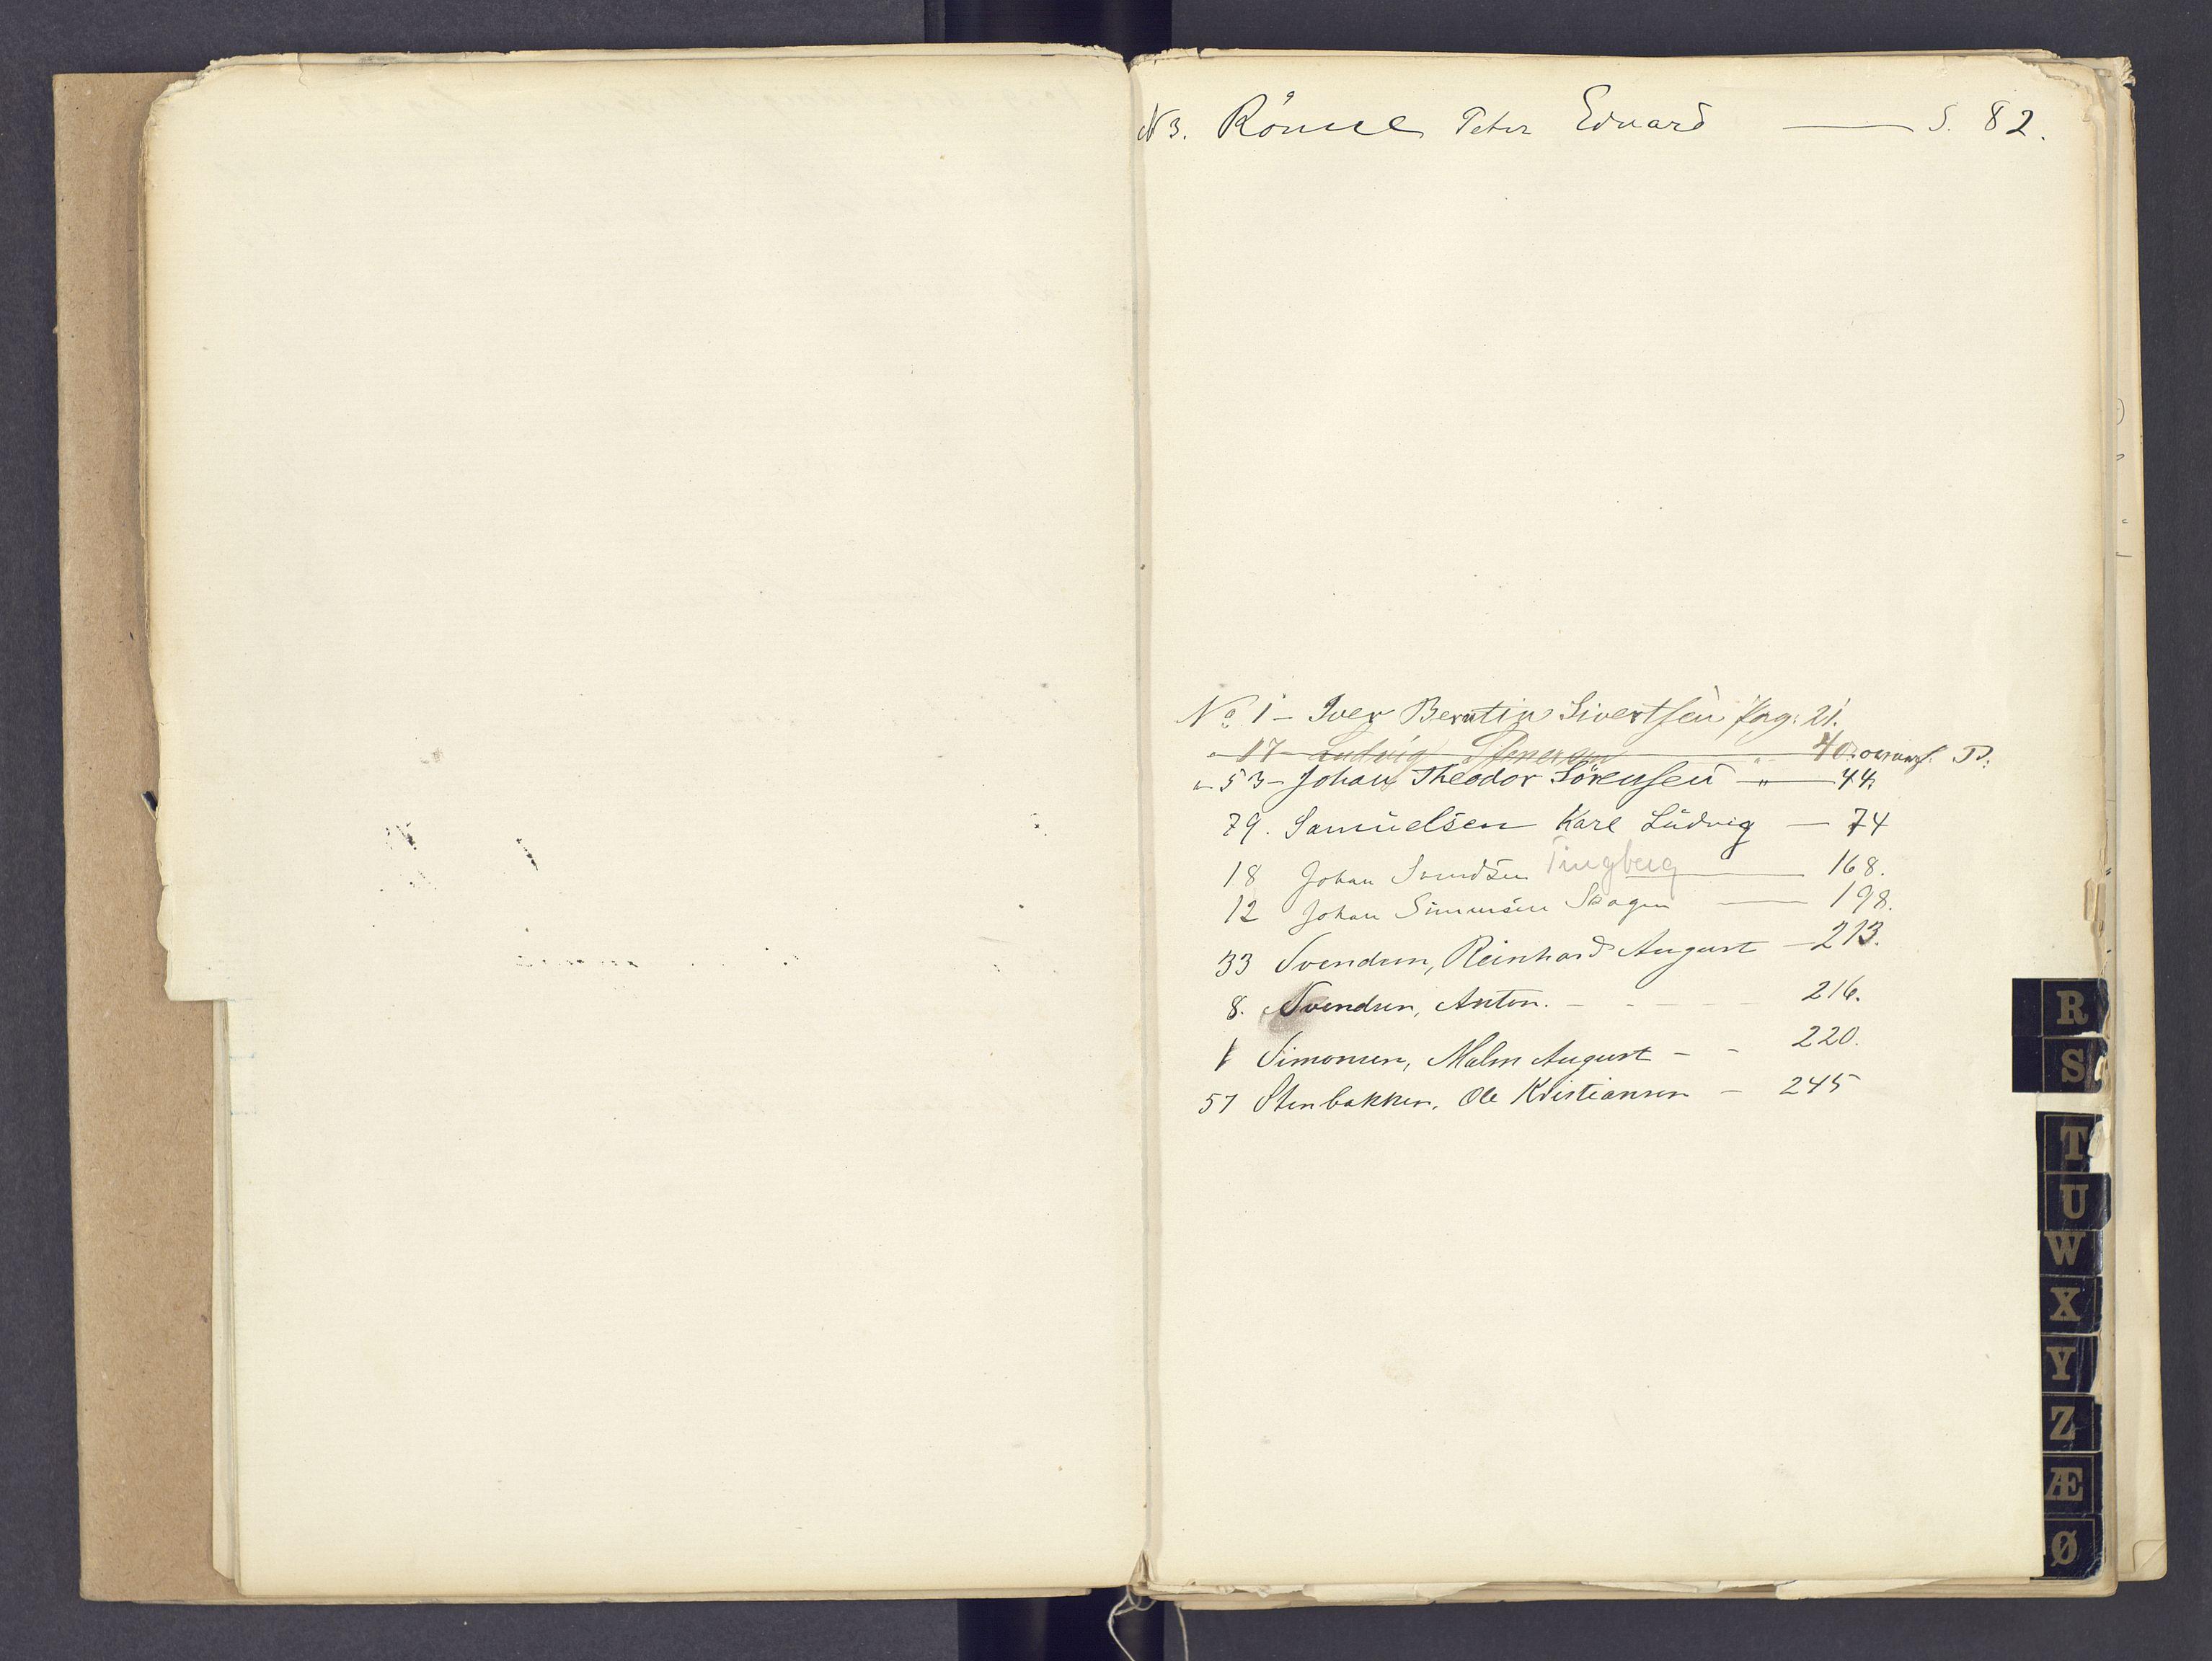 SAH, Toftes Gave, F/Fc/L0002: Elevprotokoll, 1870-1885, s. upaginert